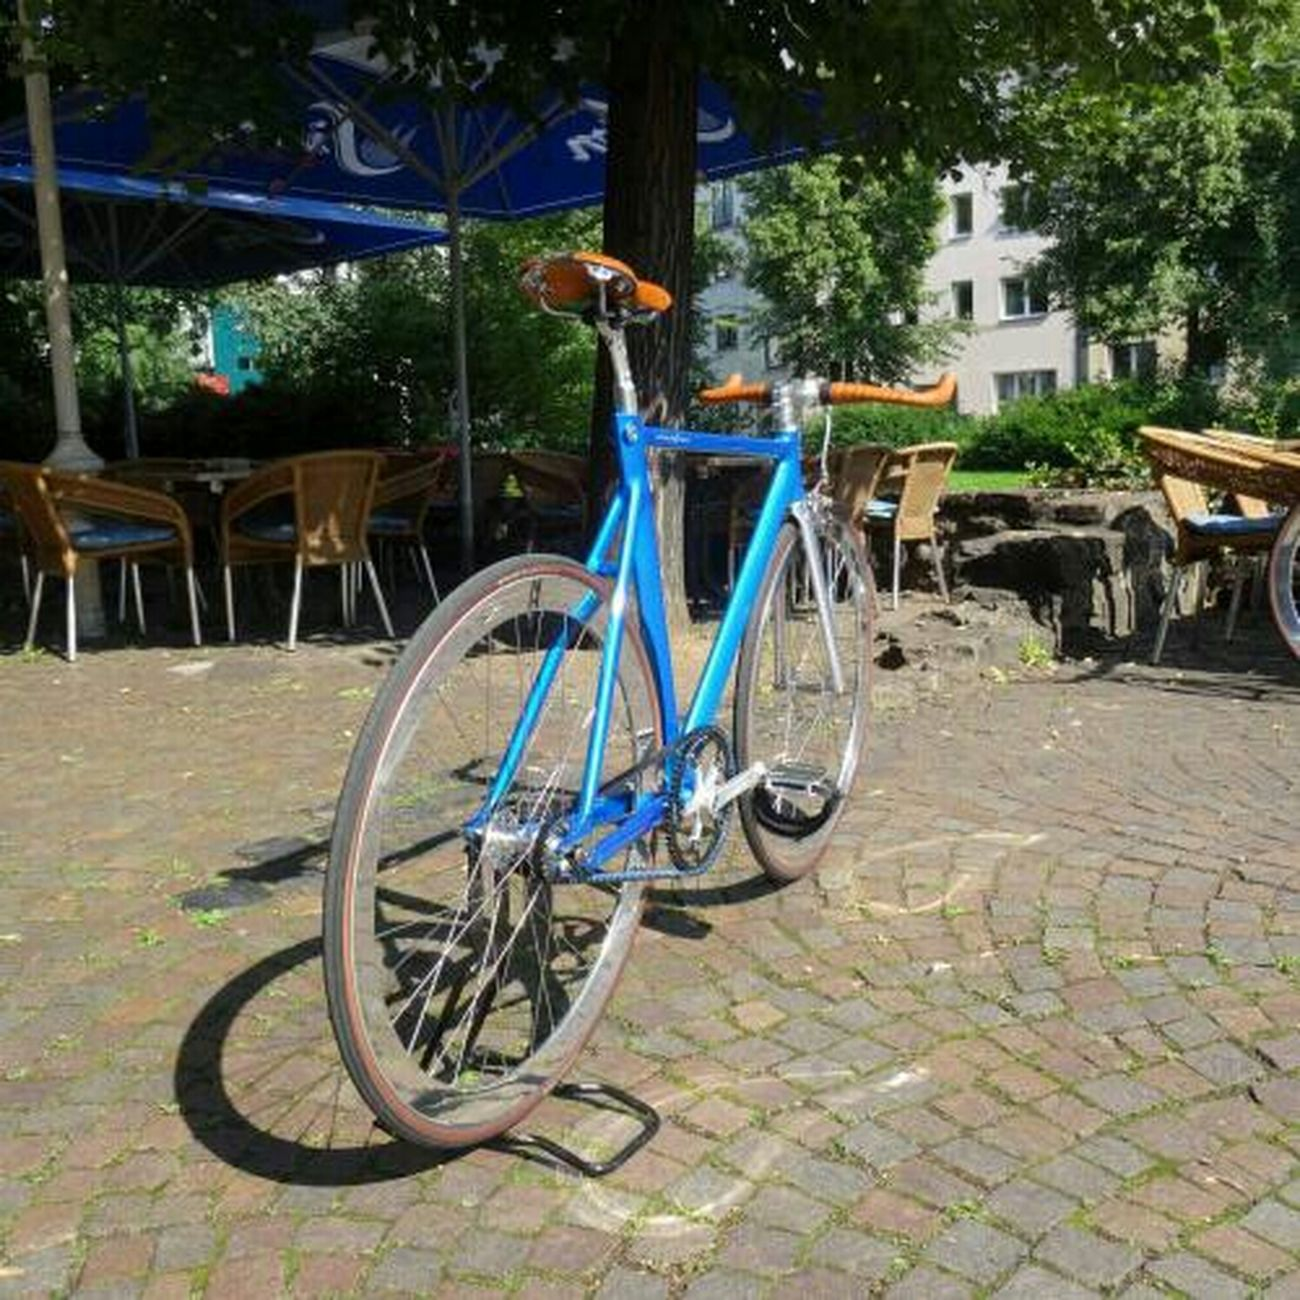 Schindelhauer Bike Fixedgear Hektor Beltdrive